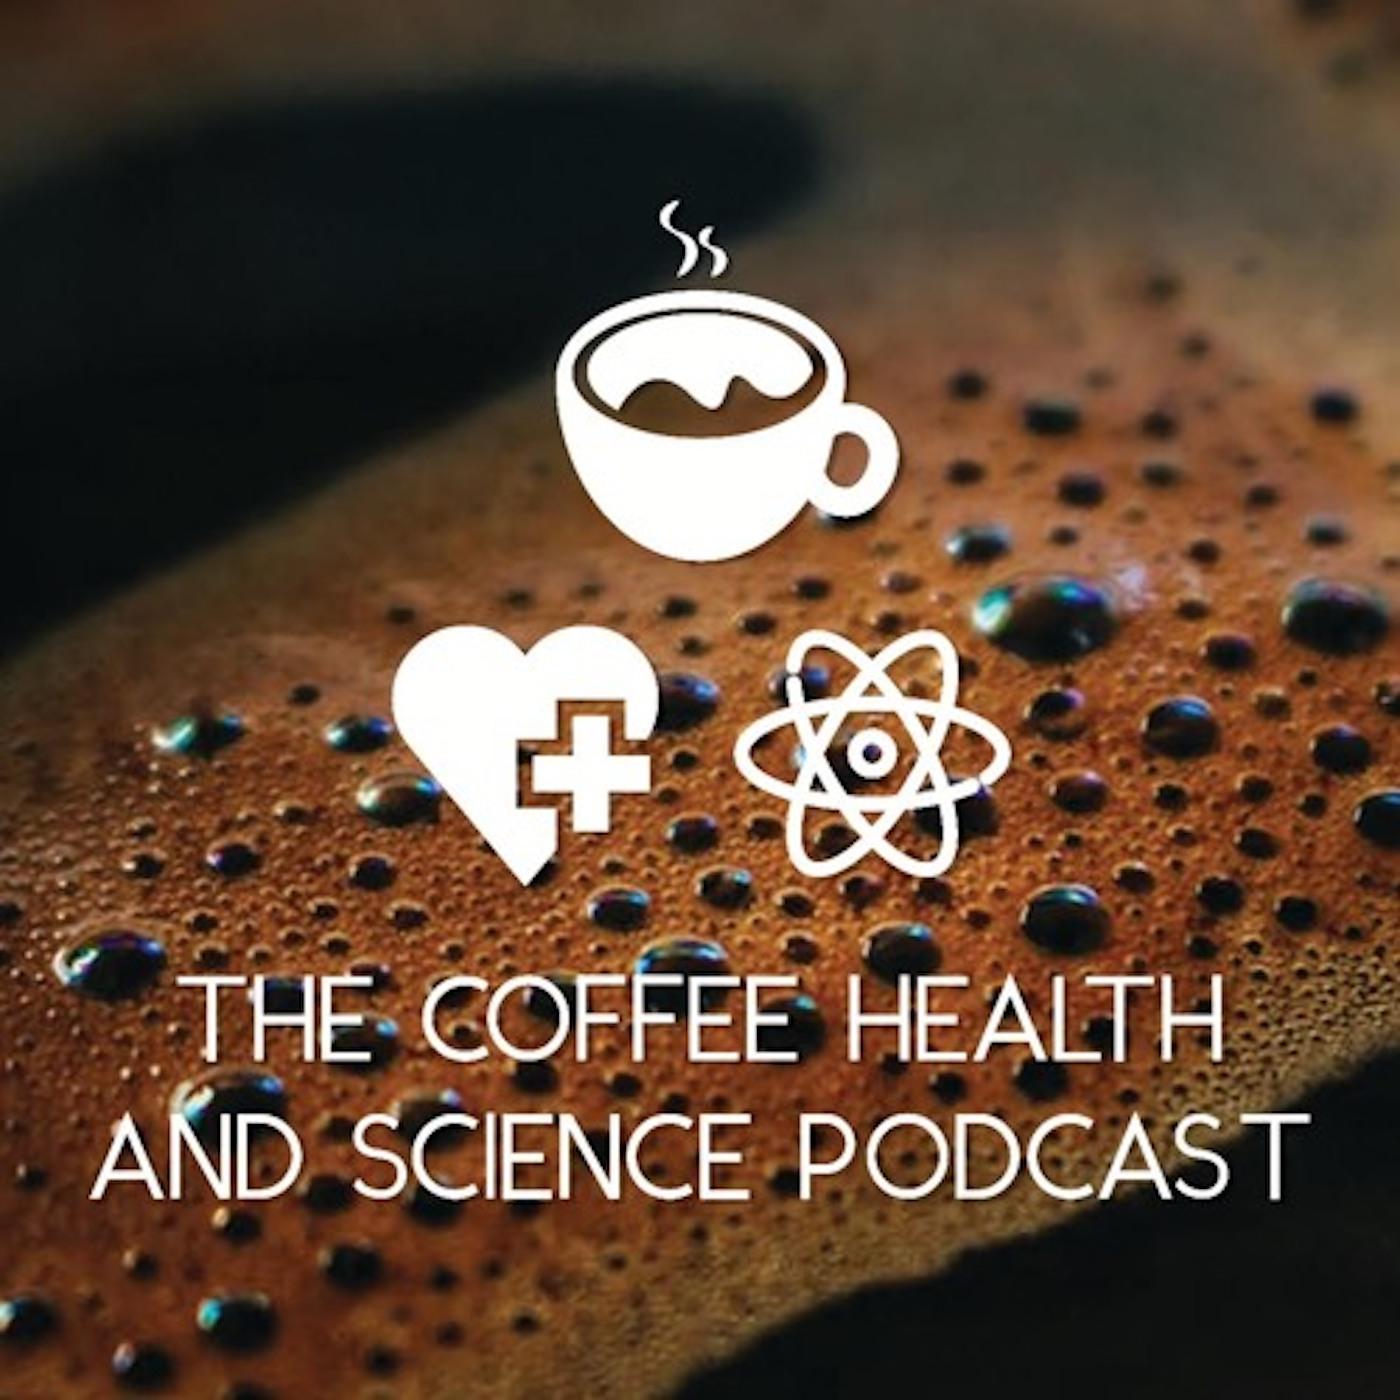 Heart Health, Caffeine, Coffee and the Heart, with Doctor Coffee